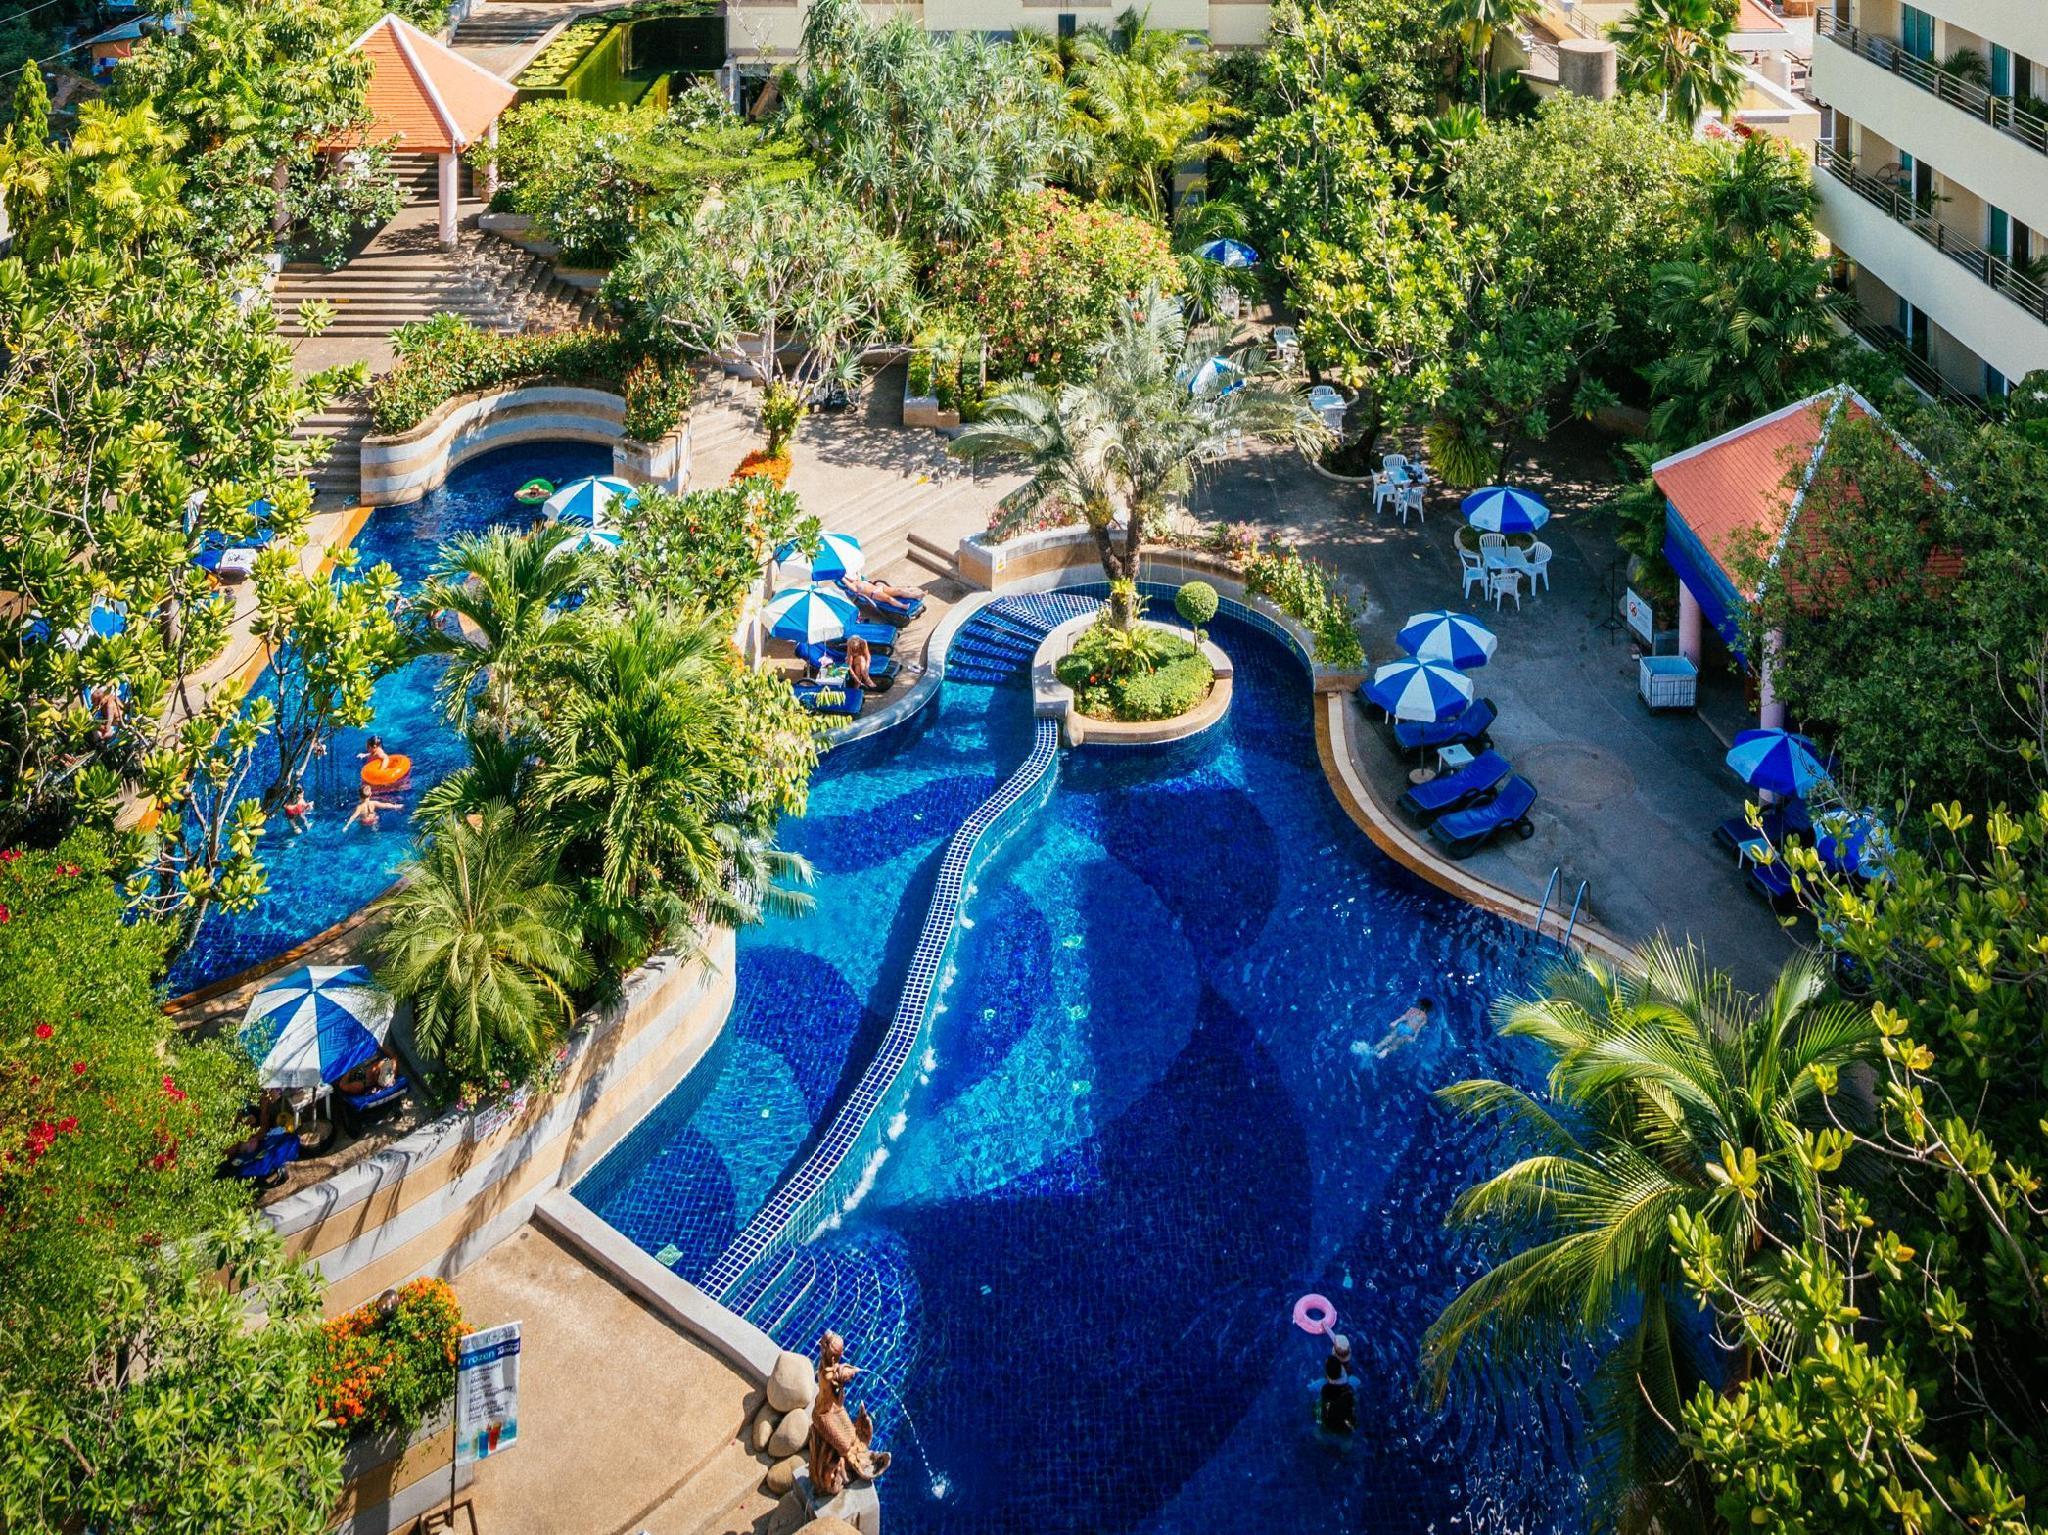 The Royal Paradise Hotel & Spa เดอะรอยัล พาราไดซ์ โฮเต็ล แอนด์ สปา